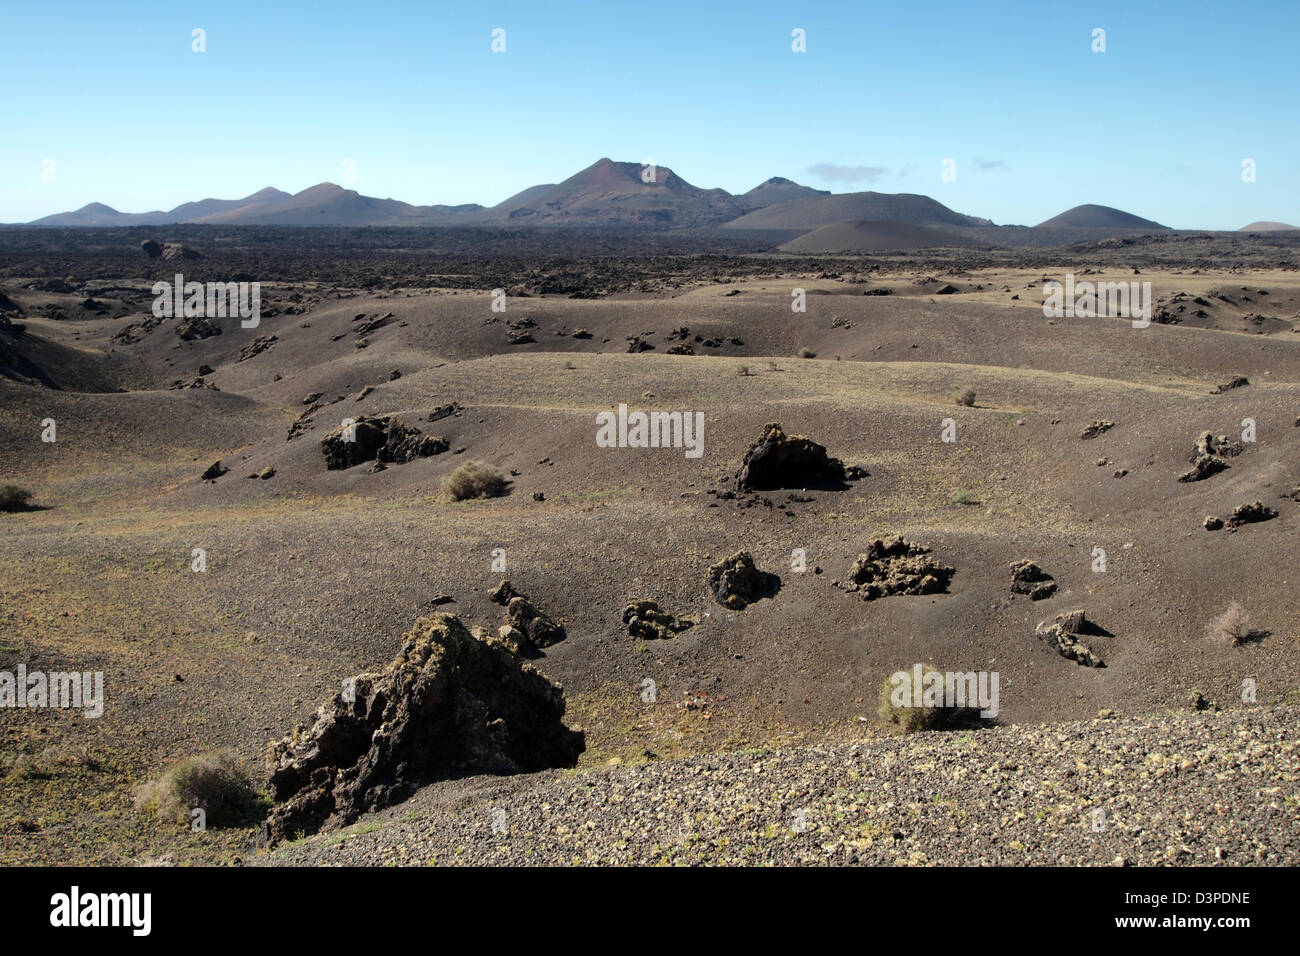 old dried lava flow fields in timanfaya, lanzarote spain - Stock Image